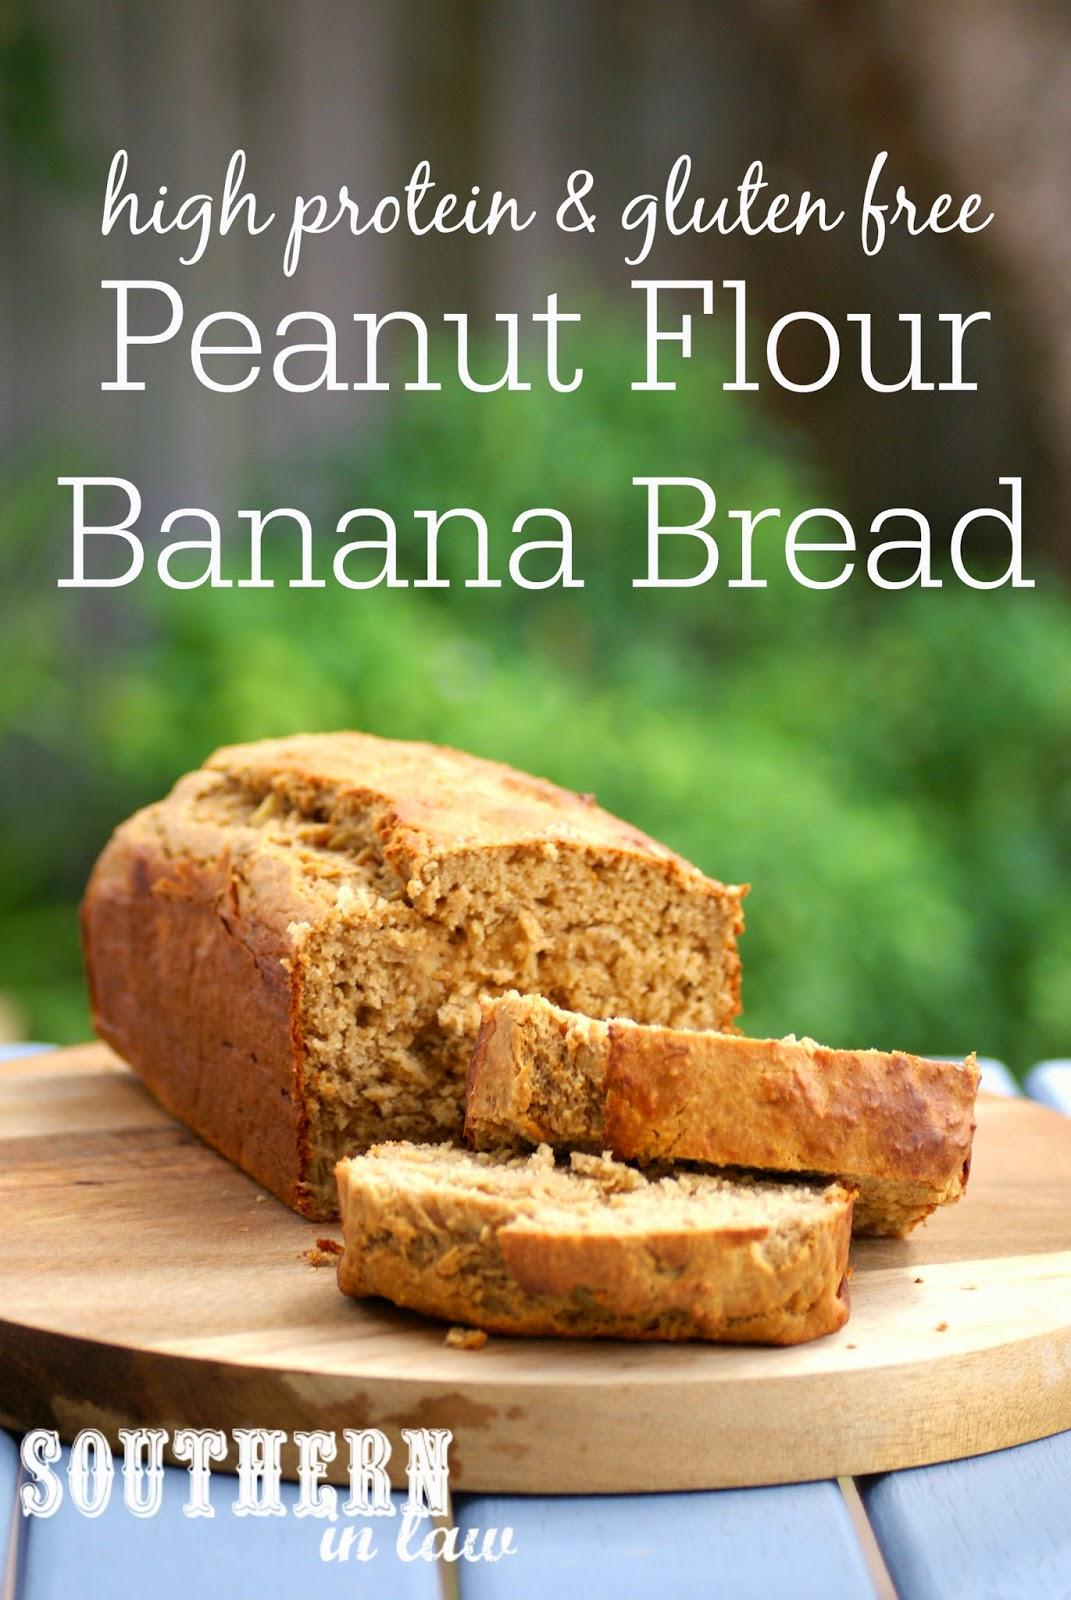 Healthy High Protein Peanut Flour Banana Bread Recipe - low fat, gluten free, healthy, high protein, sugar free, freezable recipe, freezer recipe